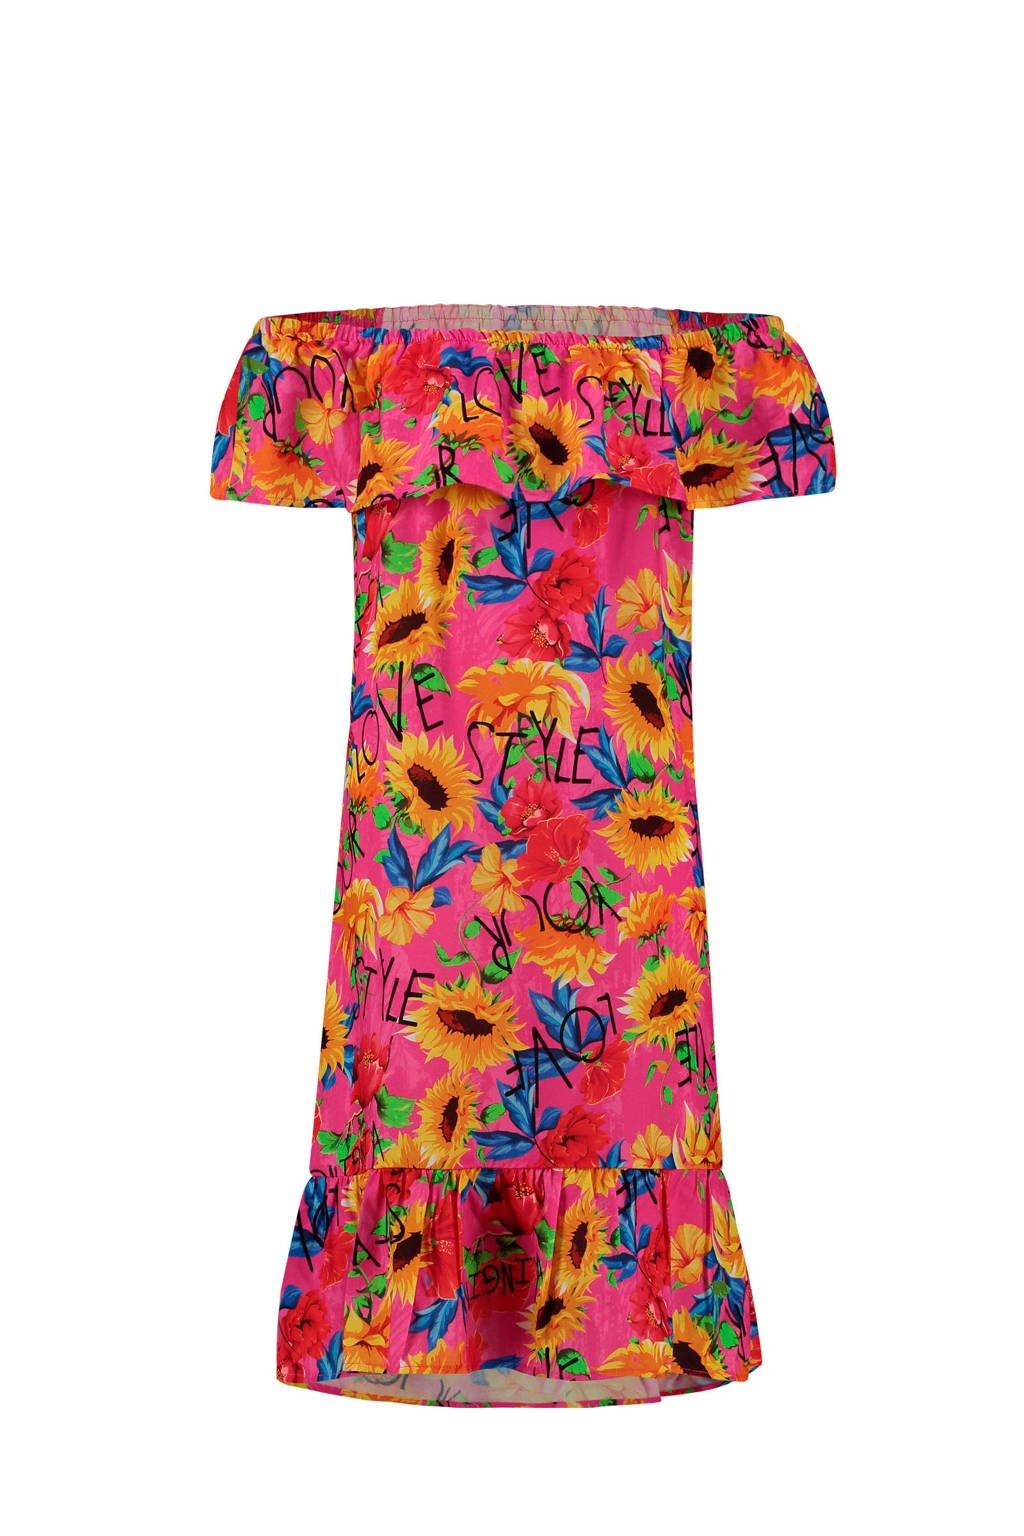 Vingino gebloemde off shoulder jurk Pelshin fuchsia/geel/blauw, Fuchsia/geel/blauw